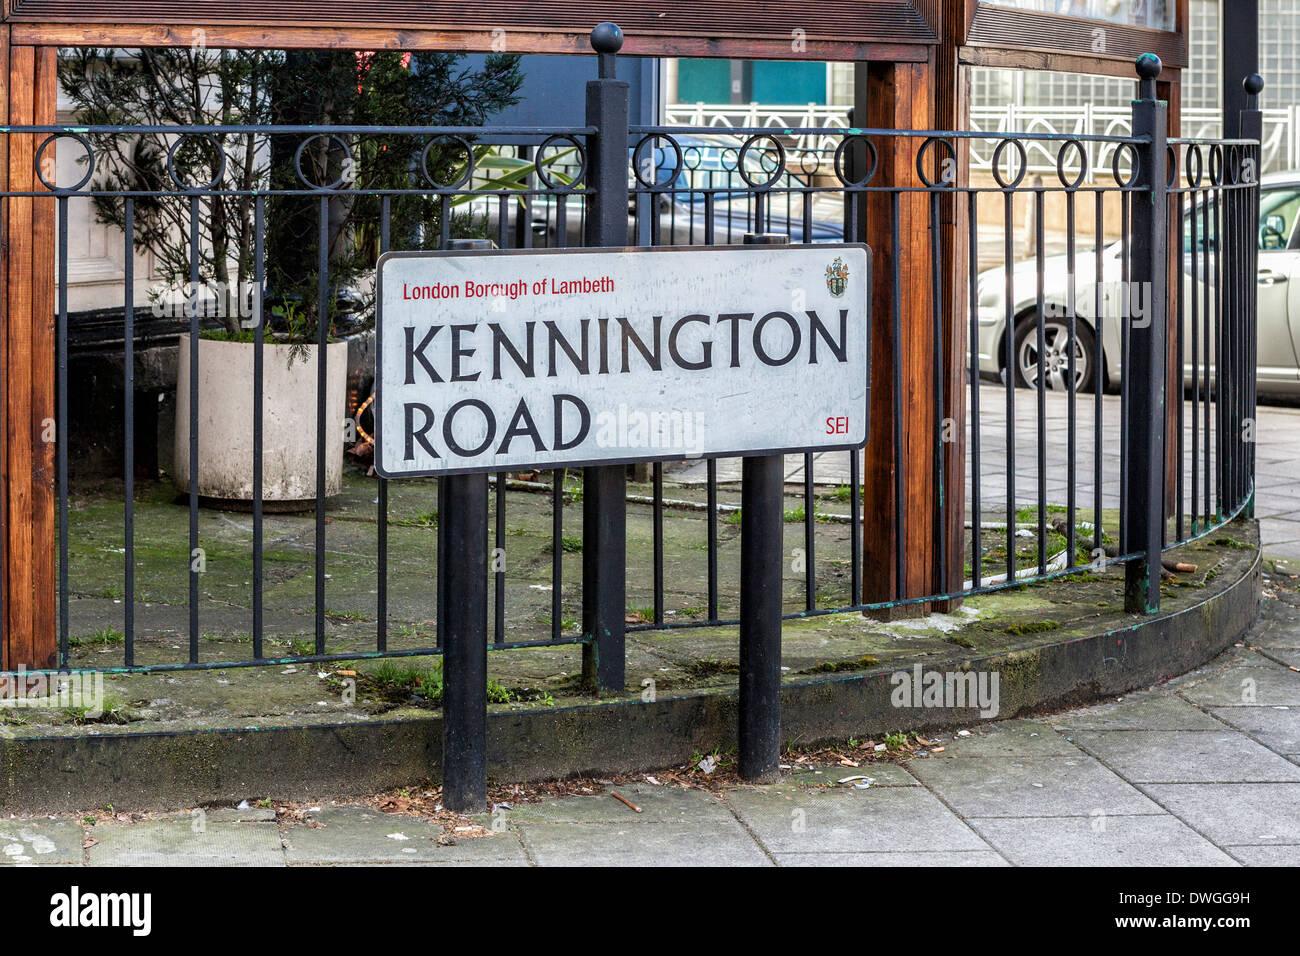 Kennington Road street sign and crest, London Borough of Lambeth, Southwark, South London, SE1 - Stock Image